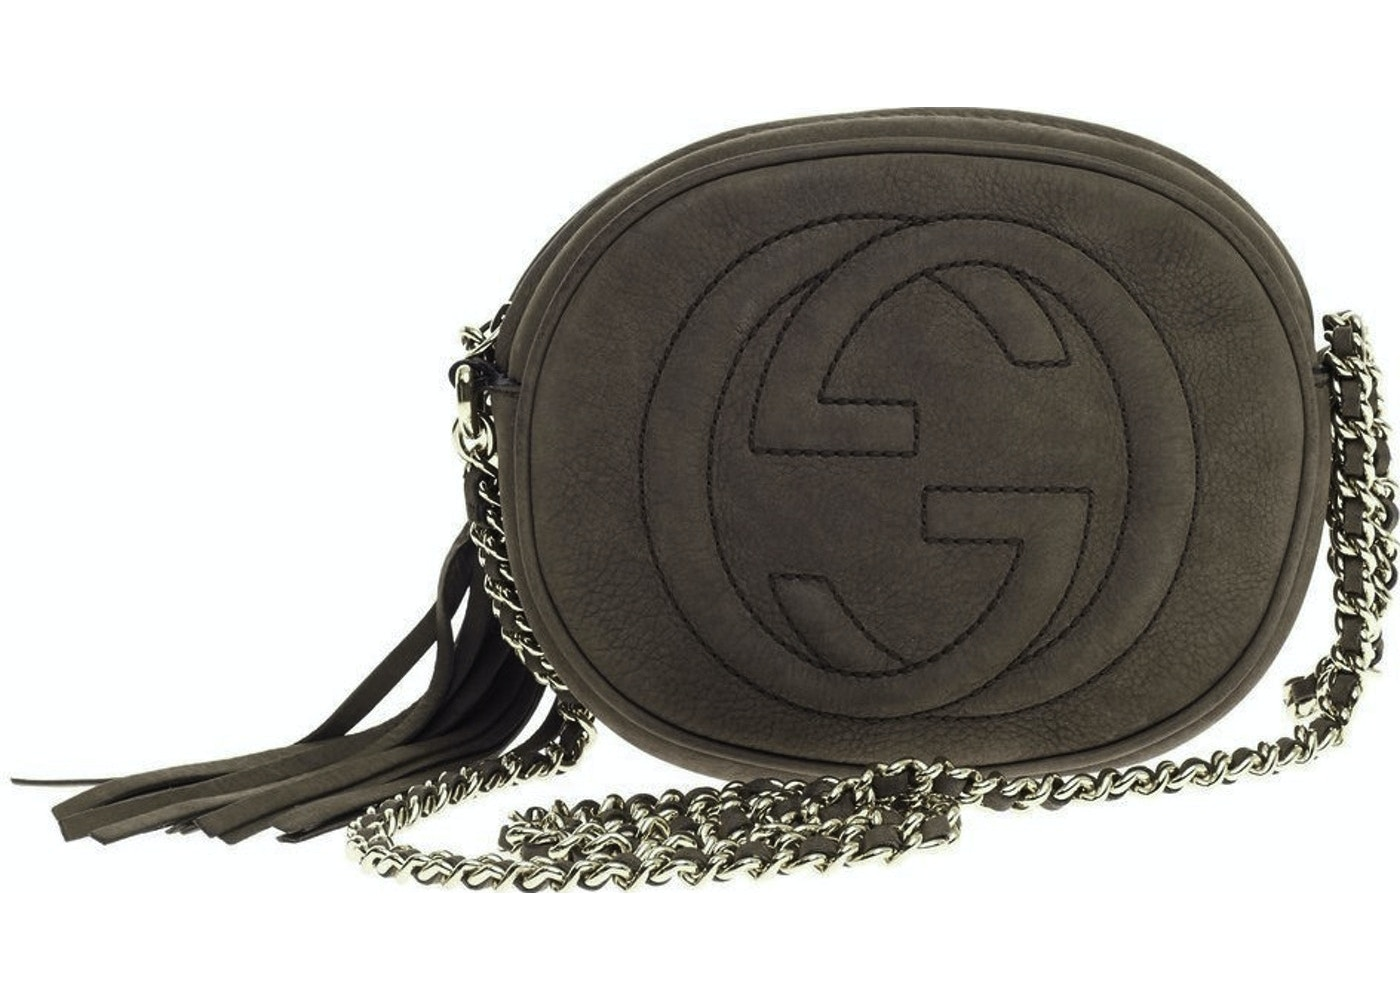 5a96e6cf896 Sell. or Ask. View All Bids. Gucci Soho Crossbody Chain Bag Mini Brown